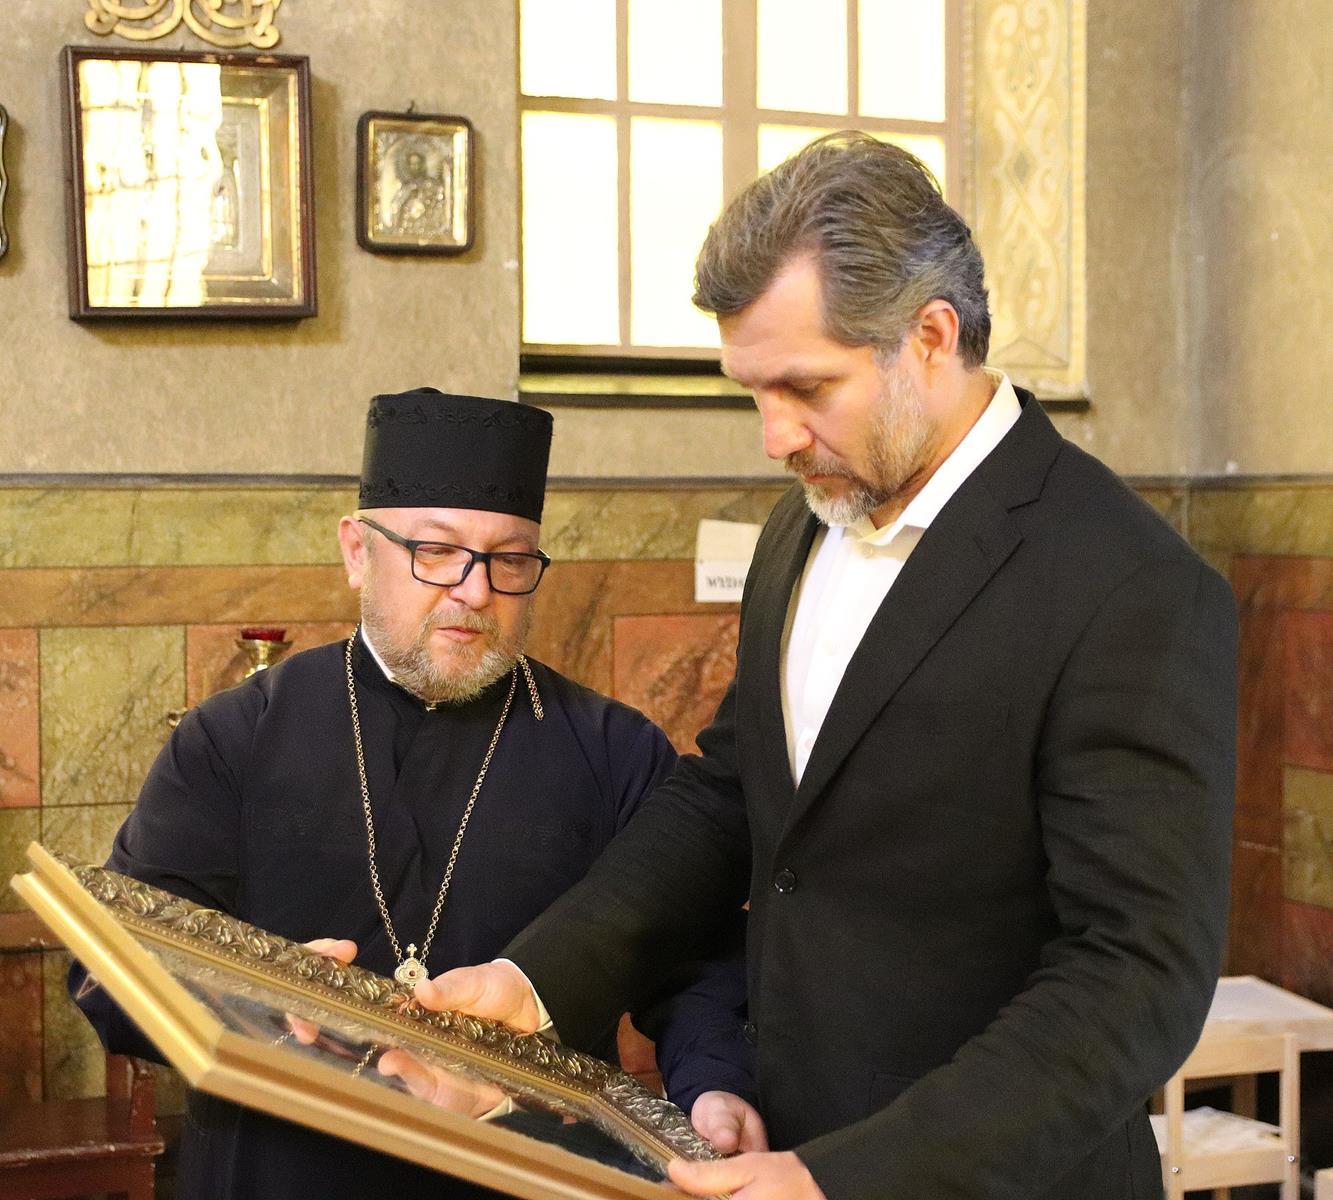 Pace konserwatorskie w cerkwi w Kaliszu